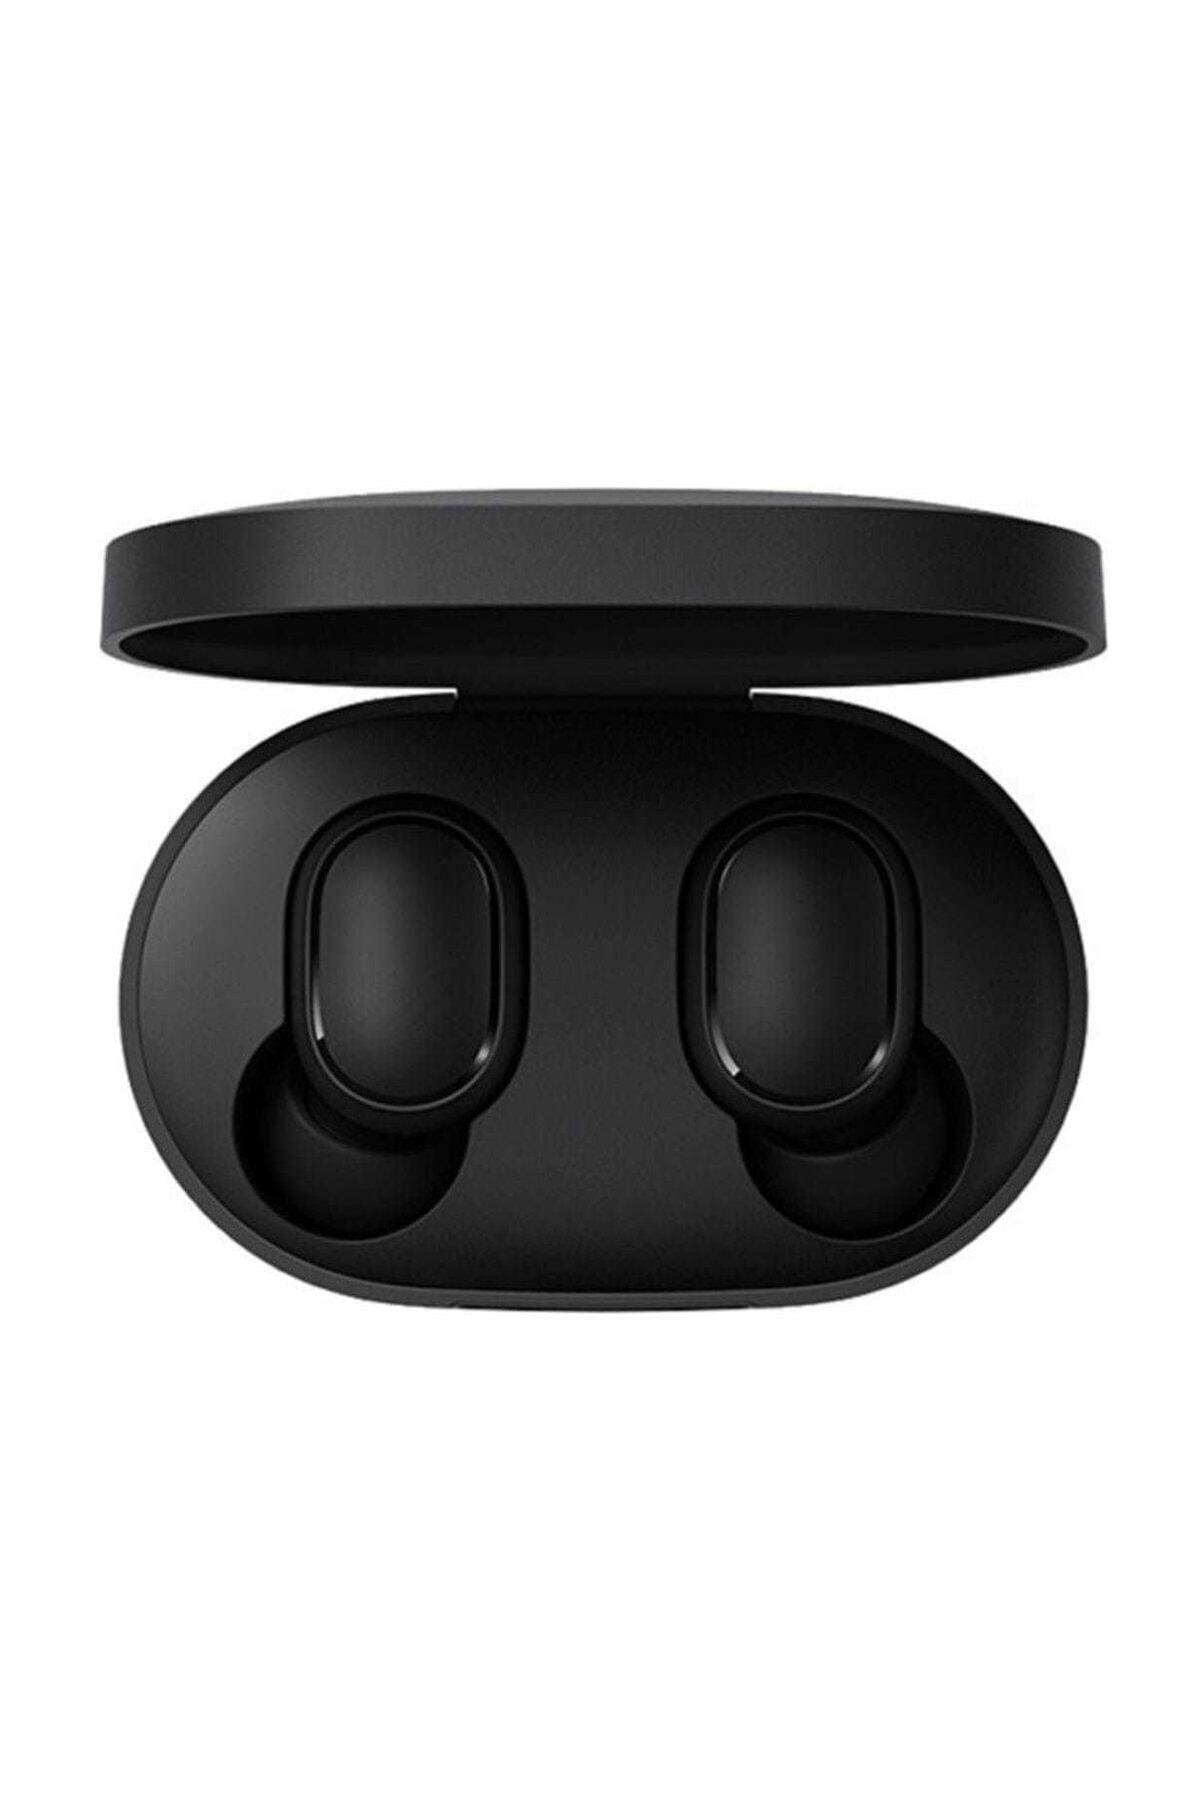 Fiyat/Performans: Xiaomi Redmi Airdots Tws Bluetooth